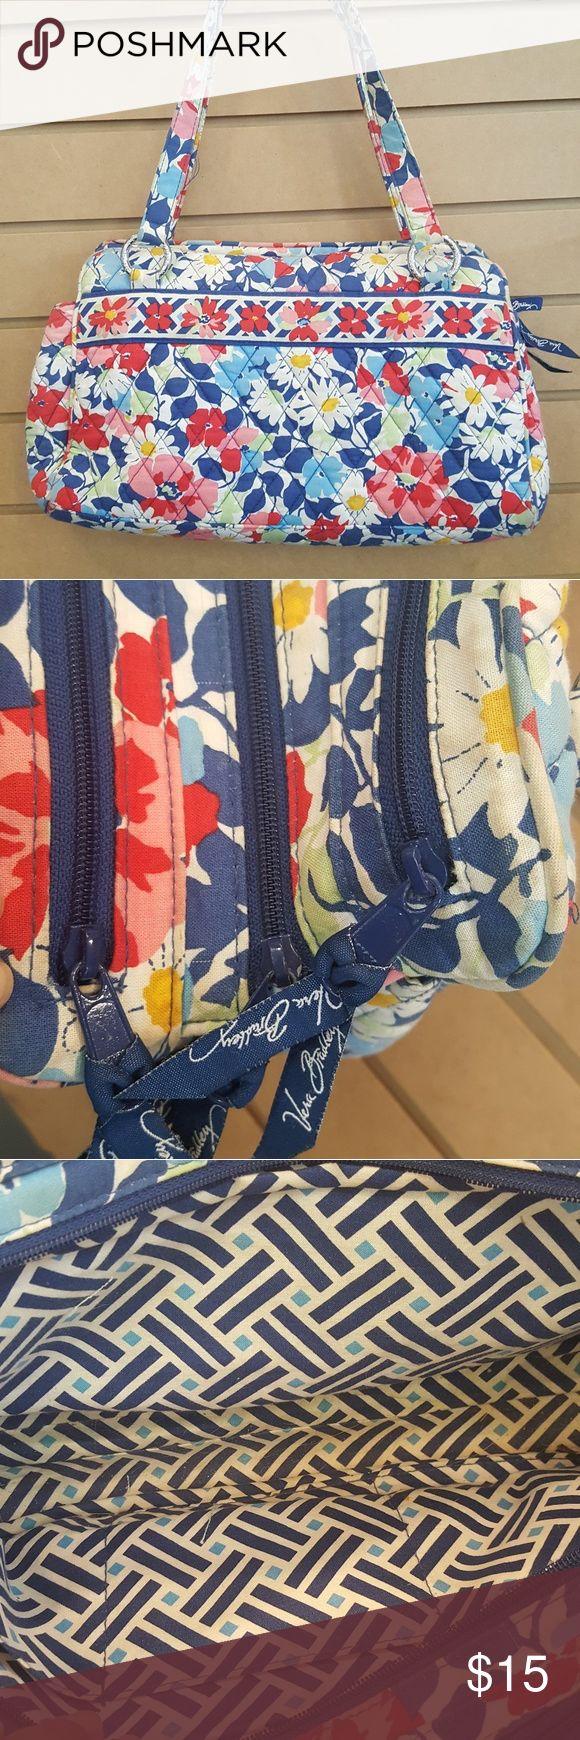 Vera Bradley handbag Vera Bradley handbag Vera Bradley Bags Shoulder Bags